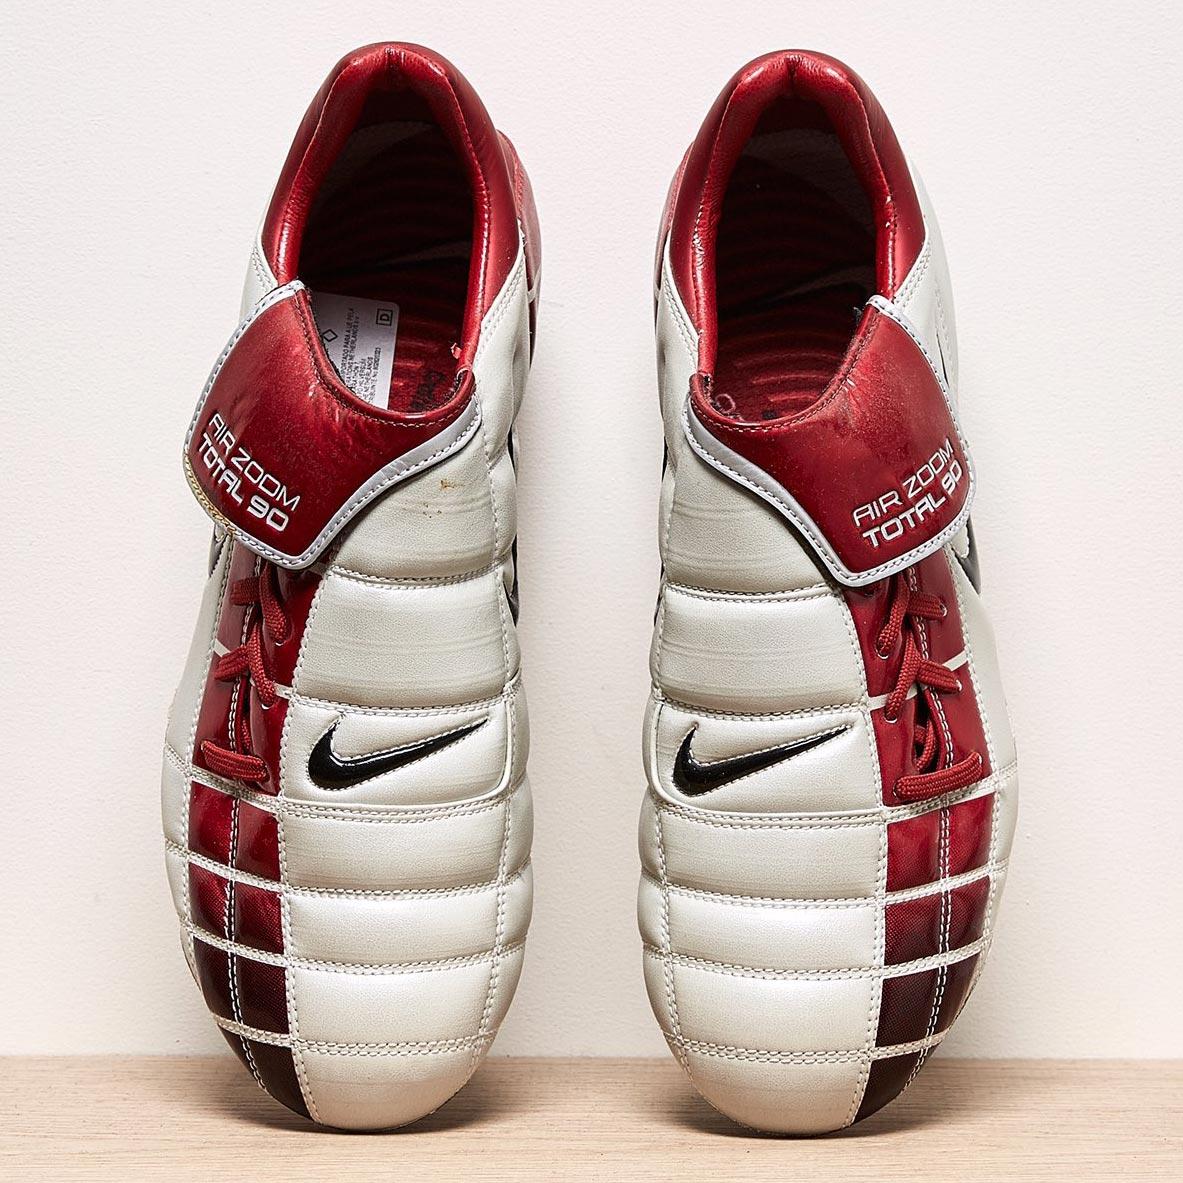 c45331340 Closer Look  Nike Air Zoom Total 90 II 2002 Football Boots - Footy ...